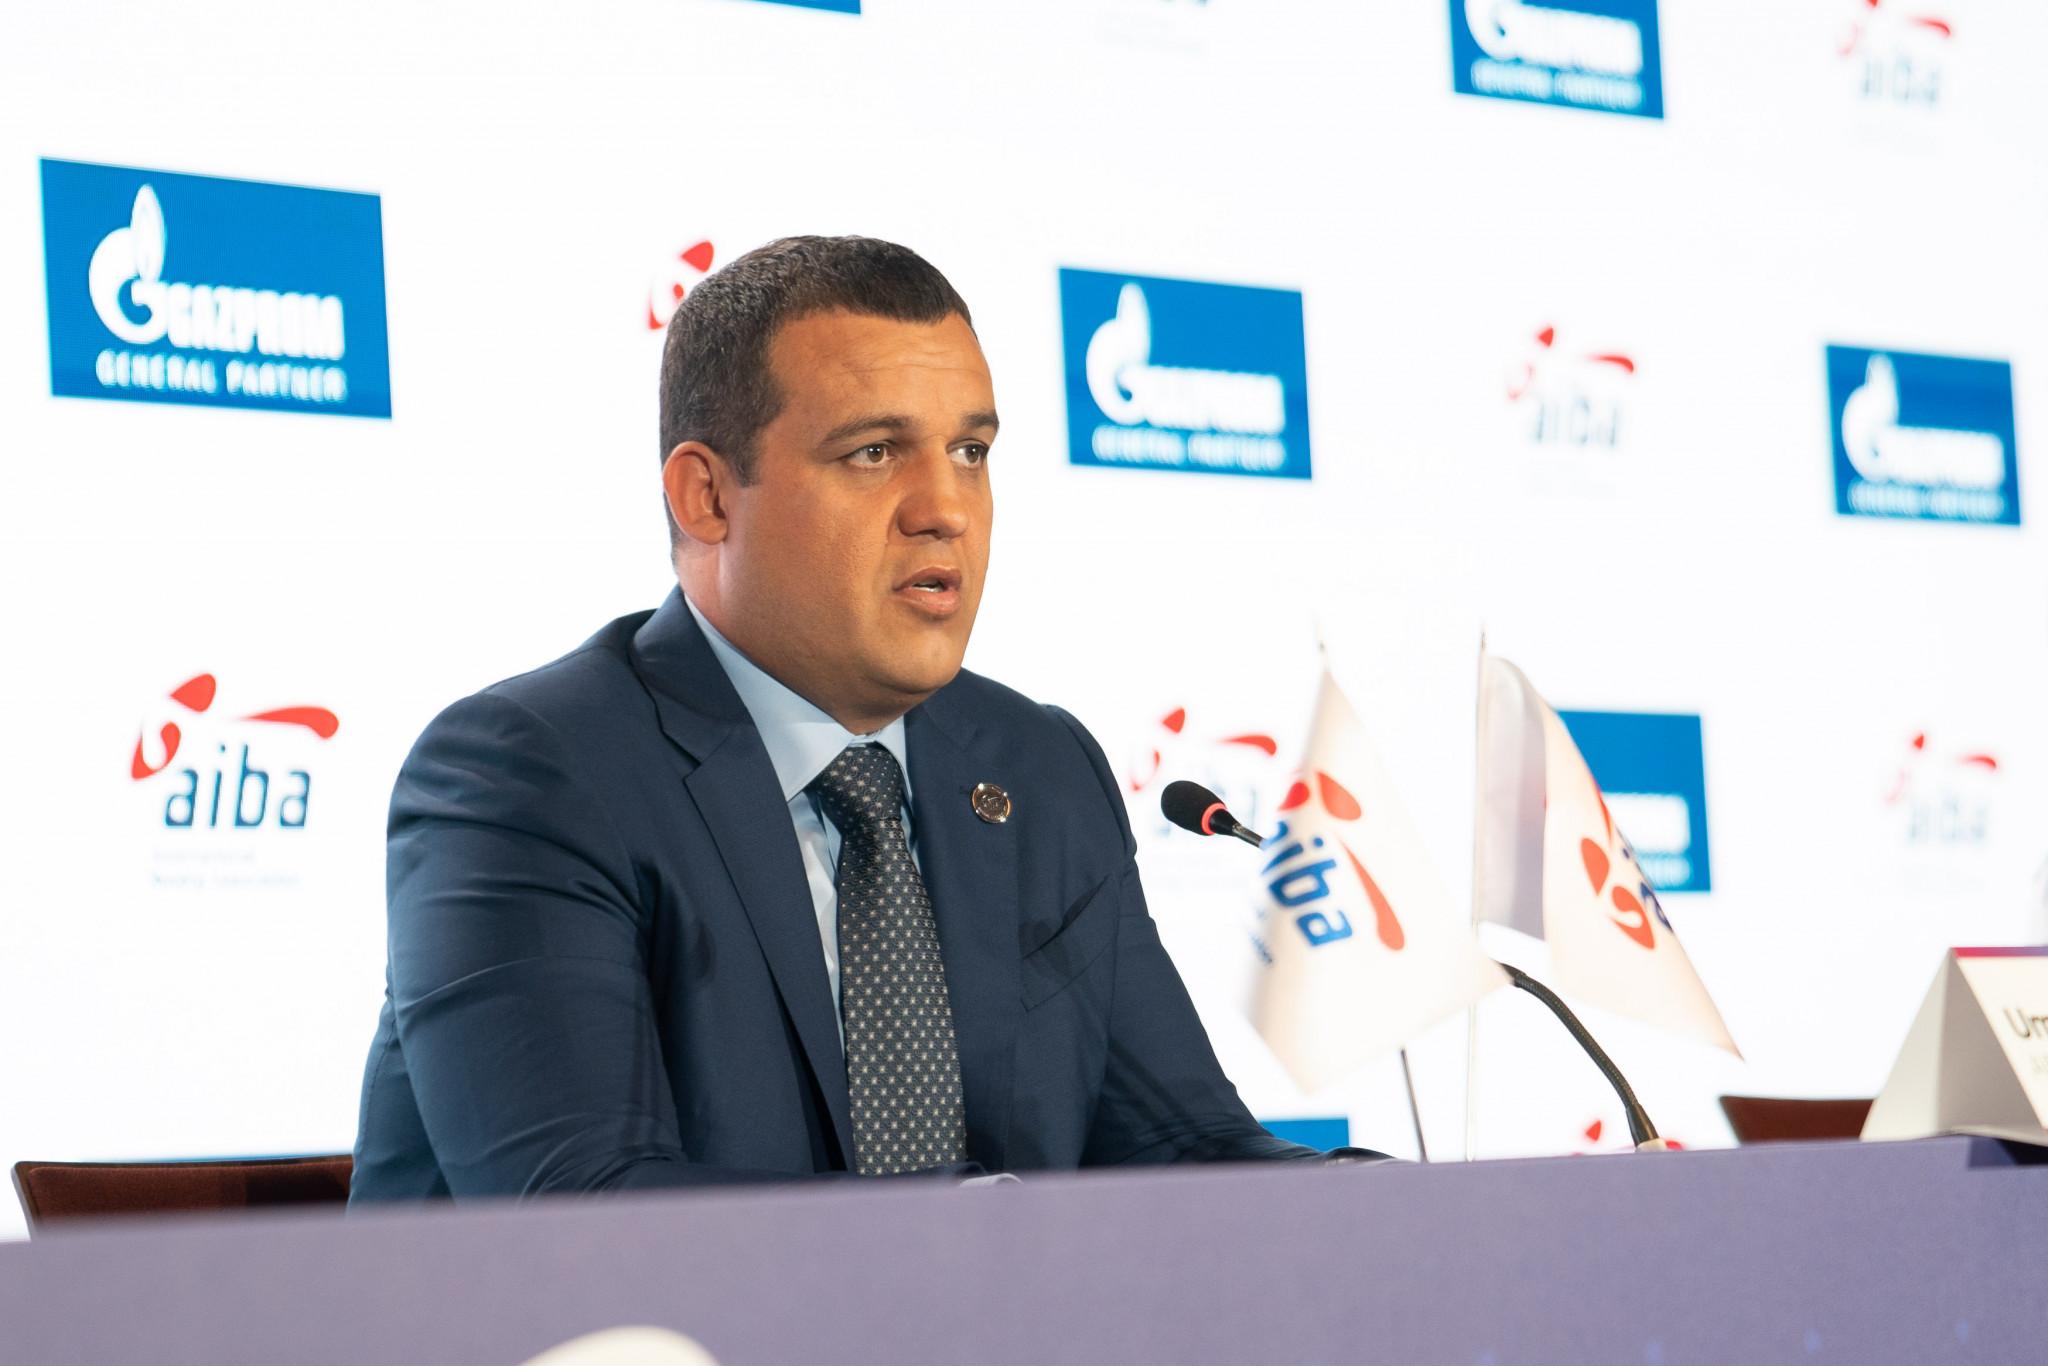 Umar Kremlev has been AIBA President for six months ©AIBA